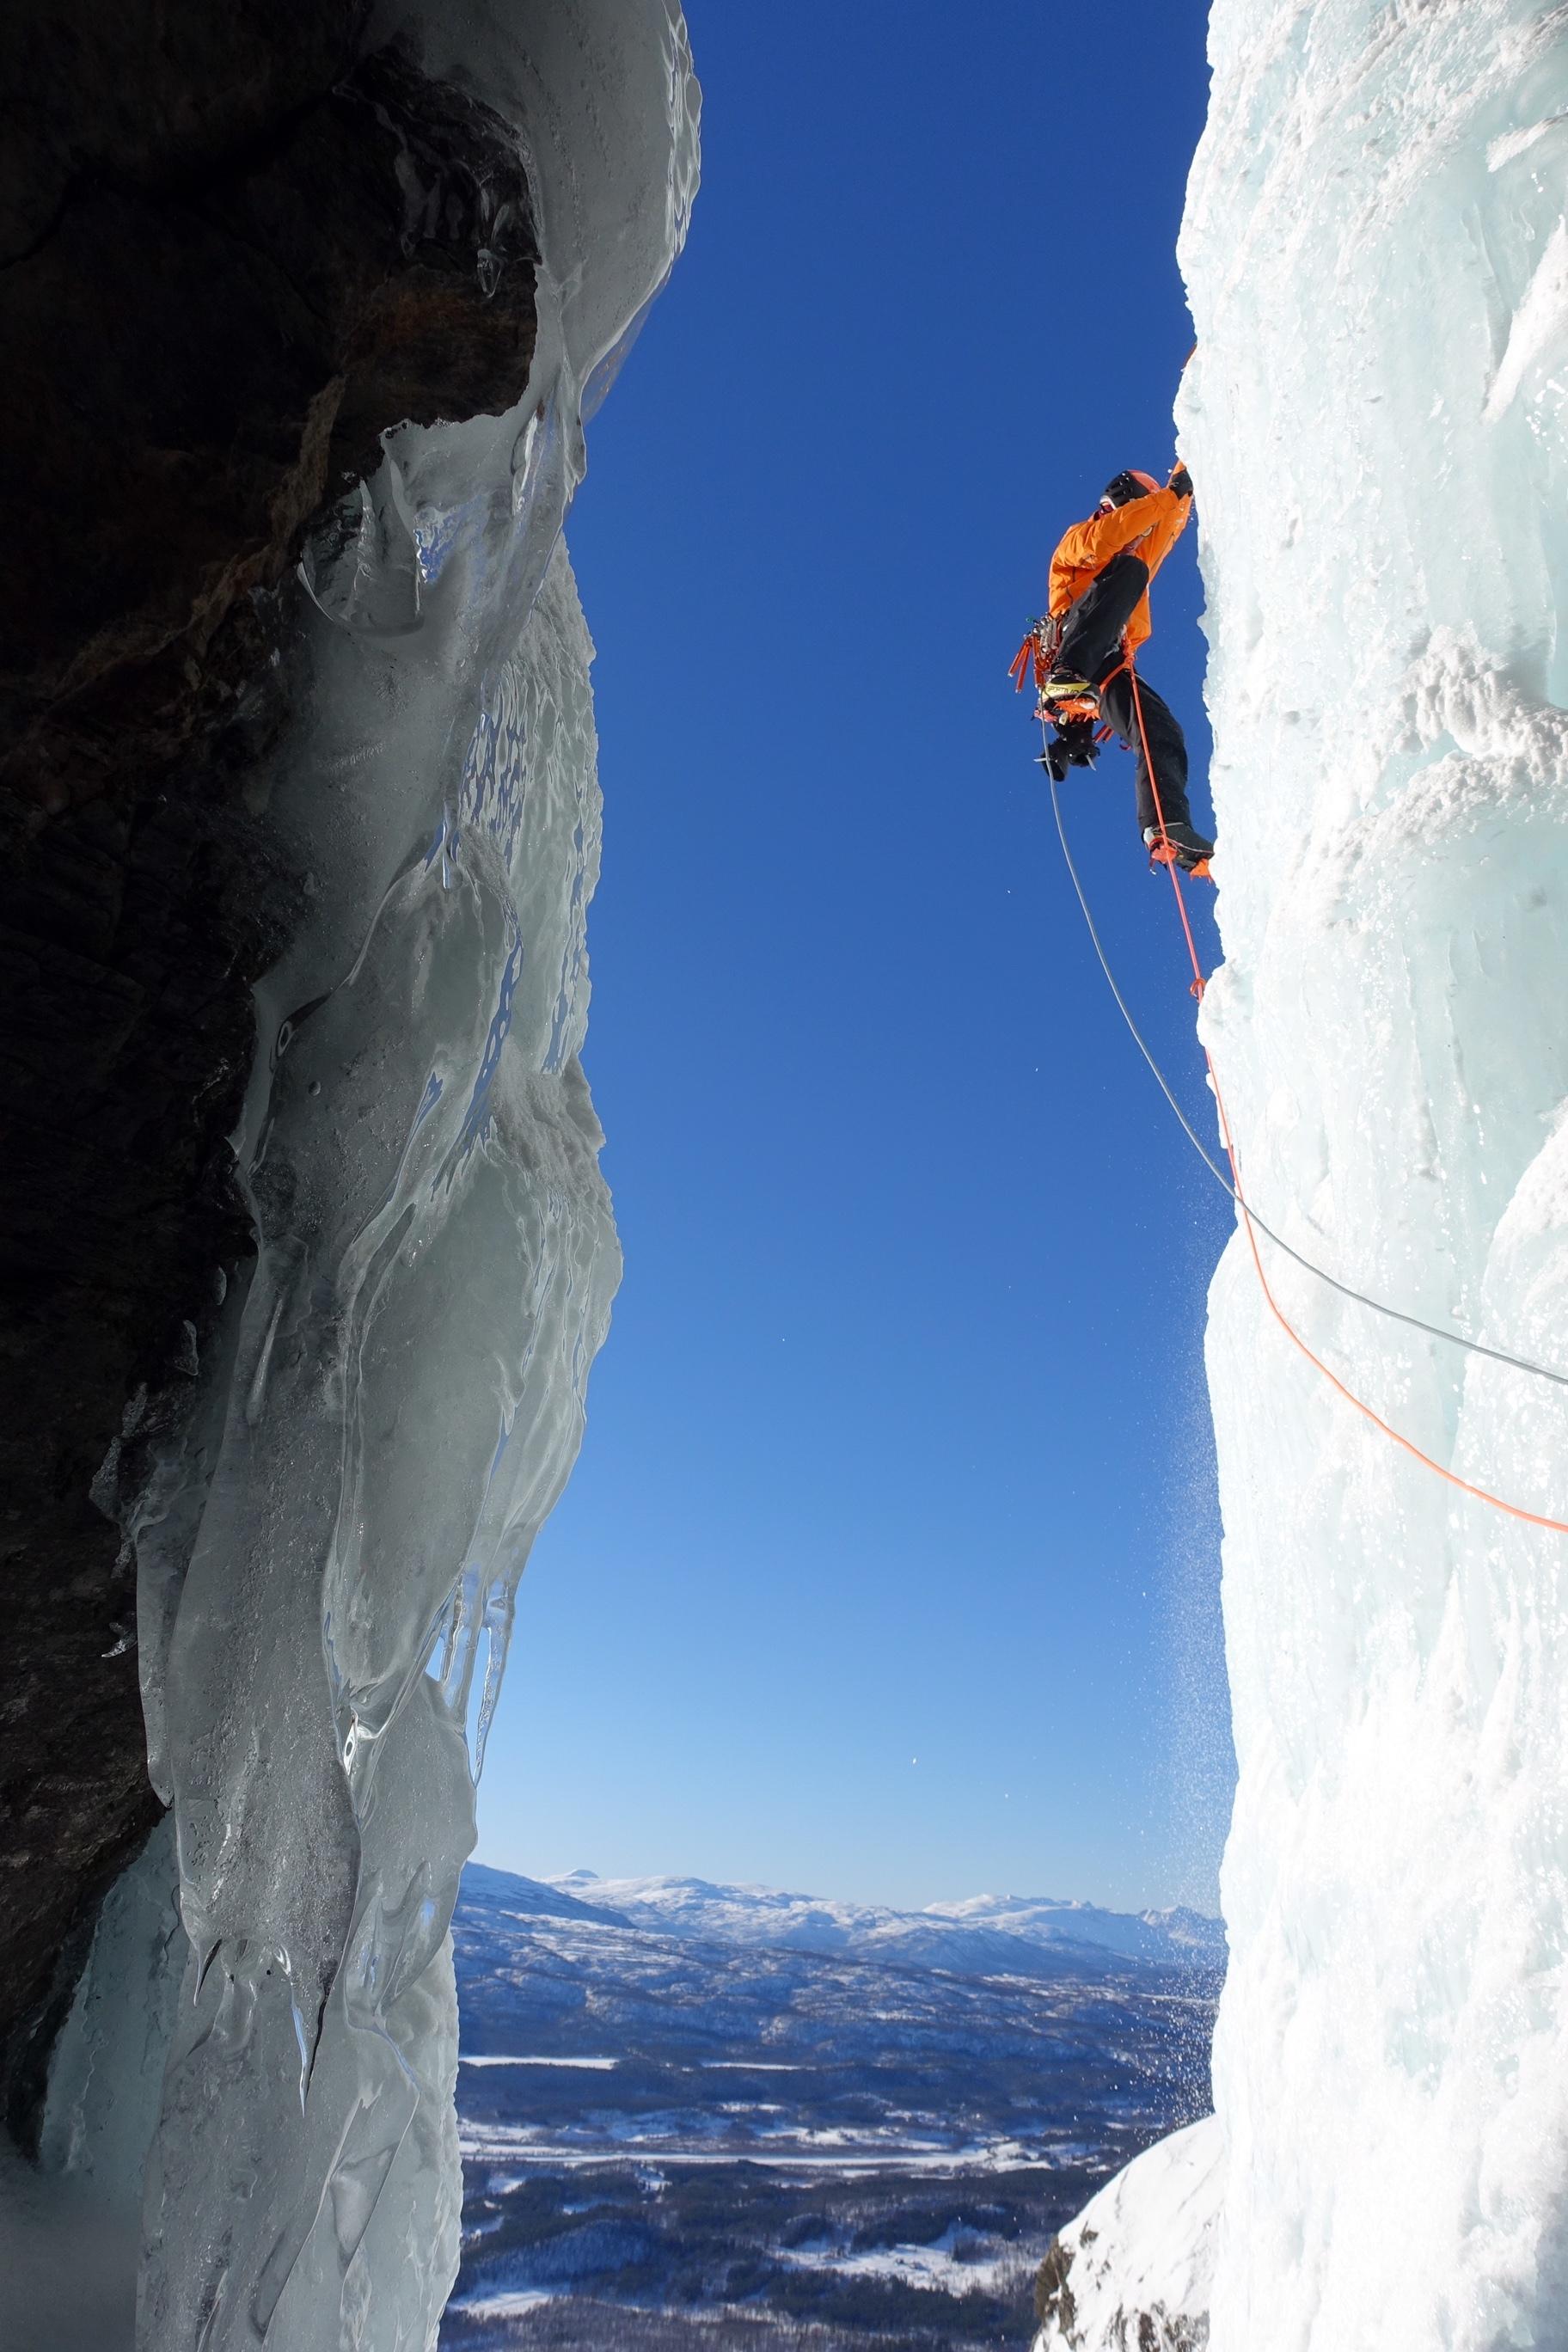 Matthias Scherer on Storstampen Pillars, March 2019, Bardujord, Norway - picture Tanja Schmitt